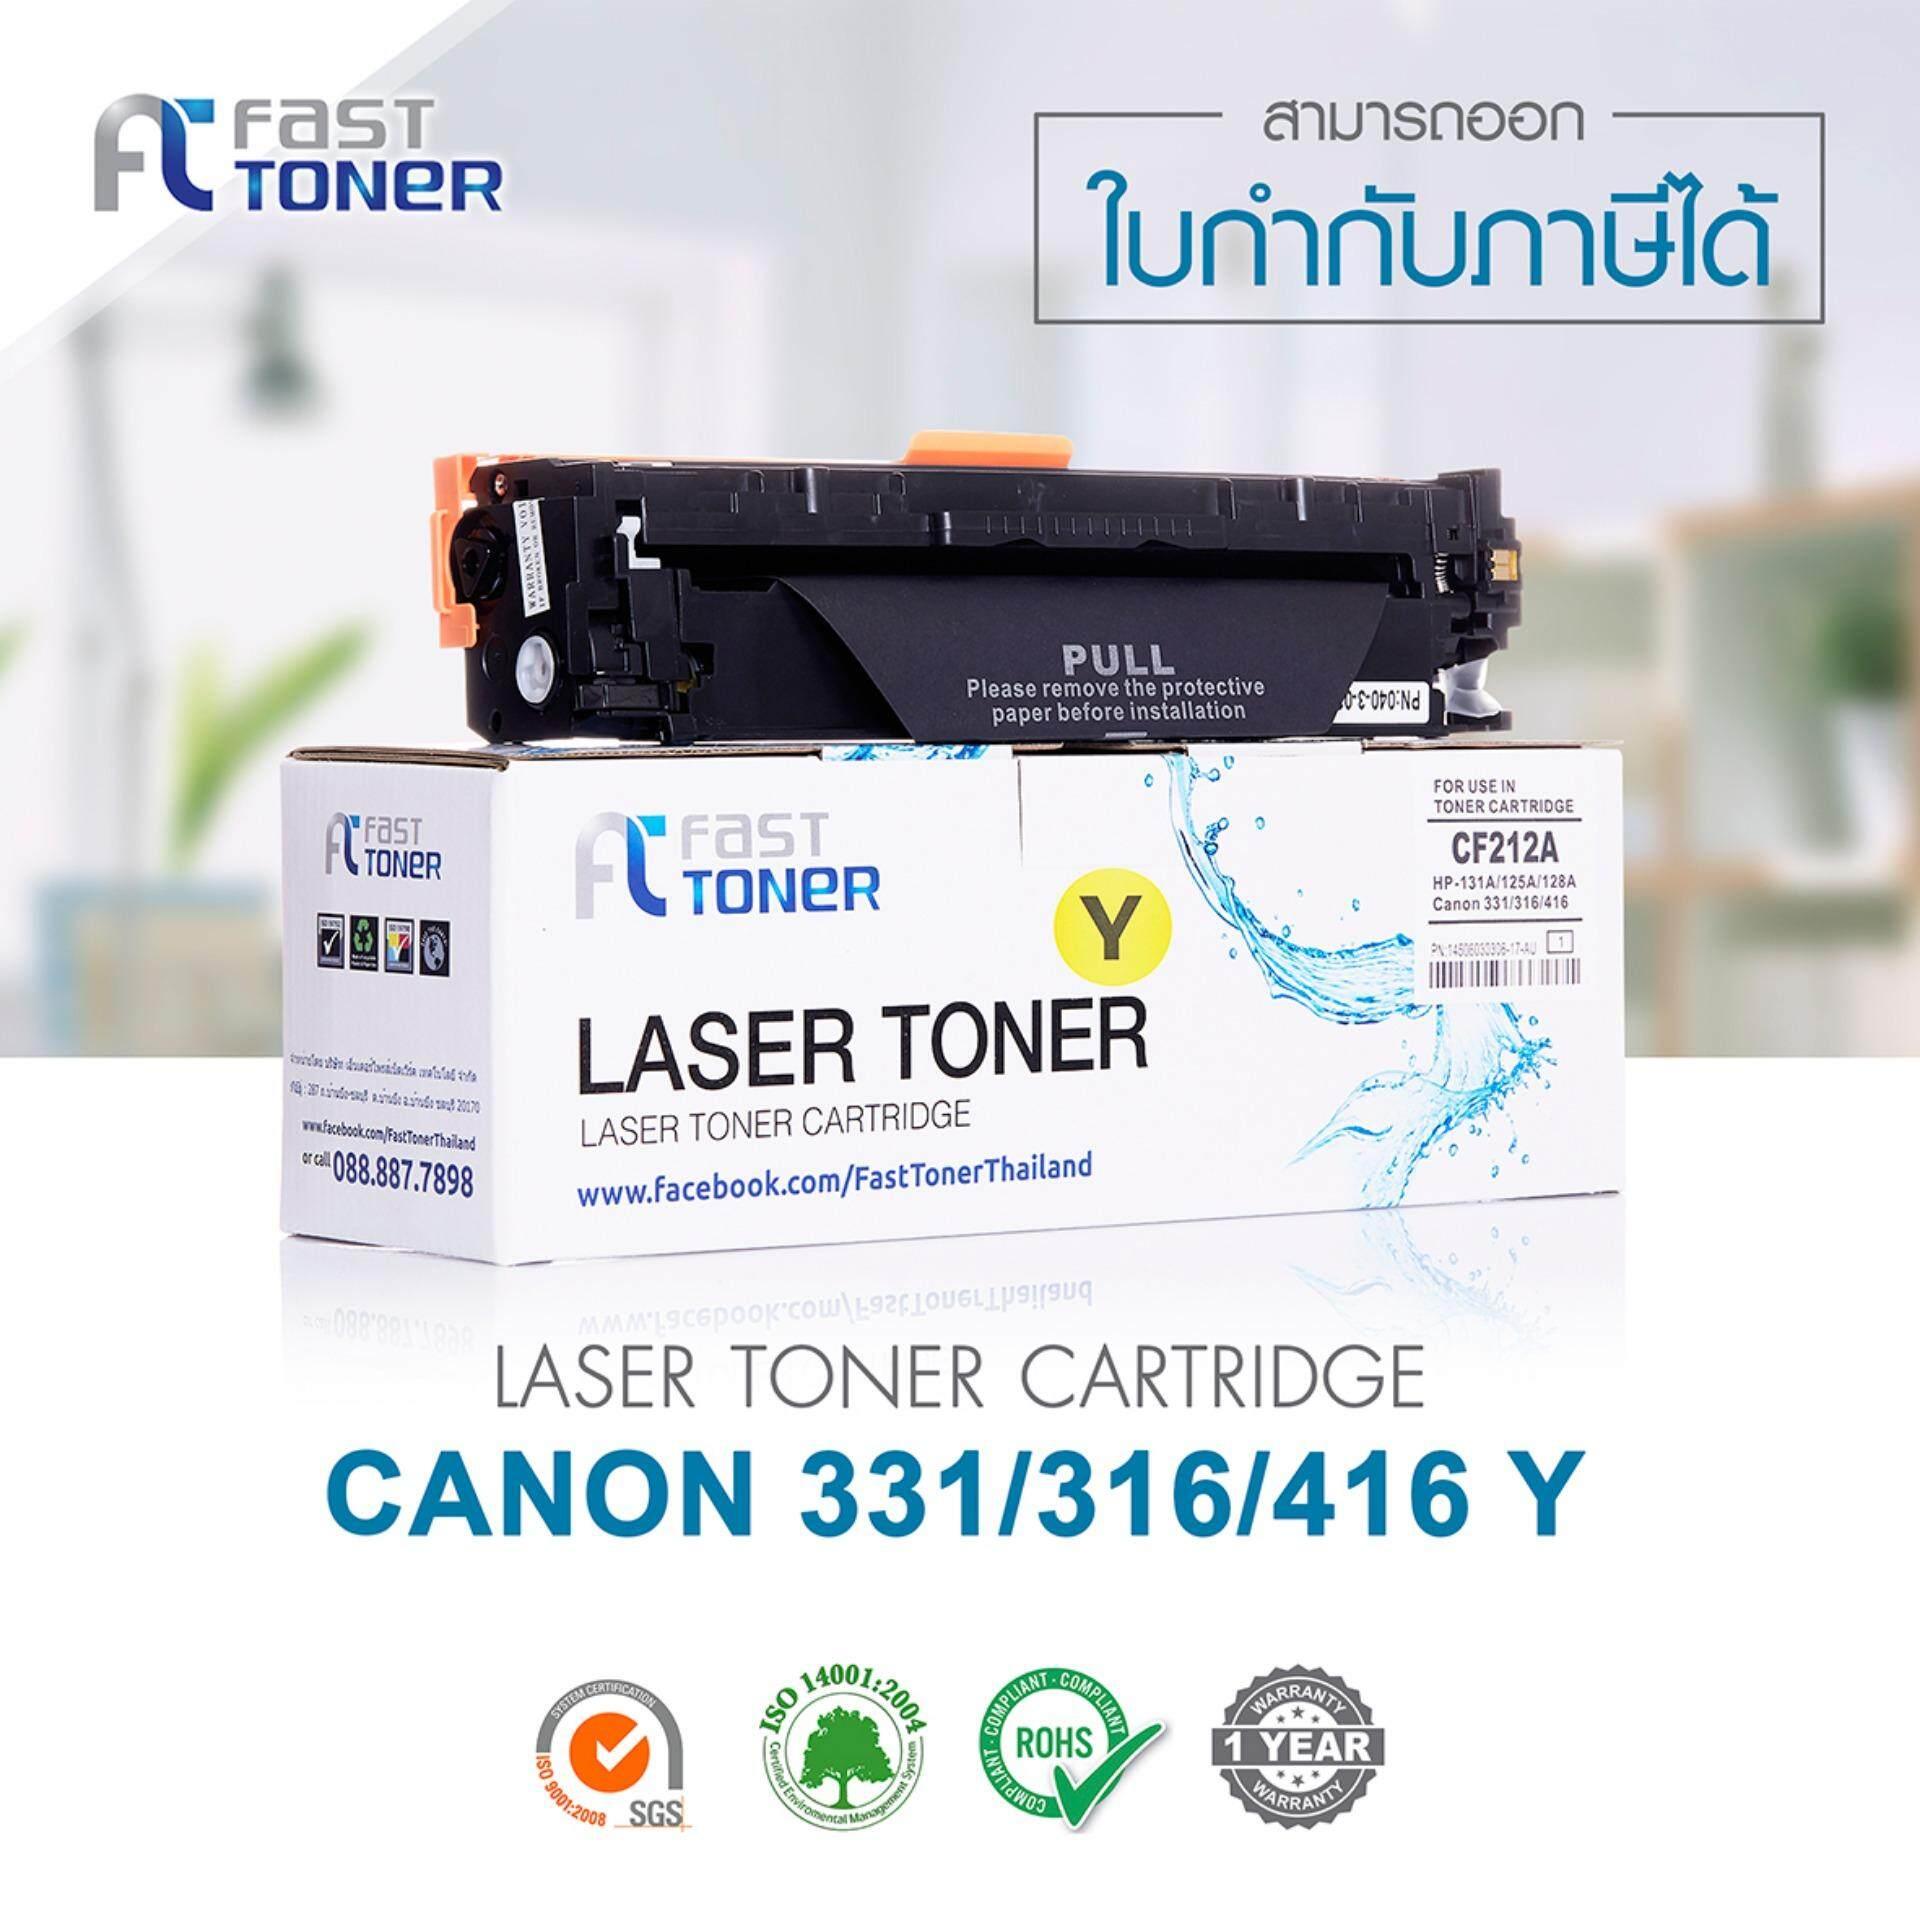 Fast Toner ตลับหมึกพิมพ์เลเซอร์ CANON Cartridge-316 (Yellow) สำหรับรุ่น LBP-5050/LBP-5050N,MF8010/MF8080Cw/MF8030Cn/MF8050Cn